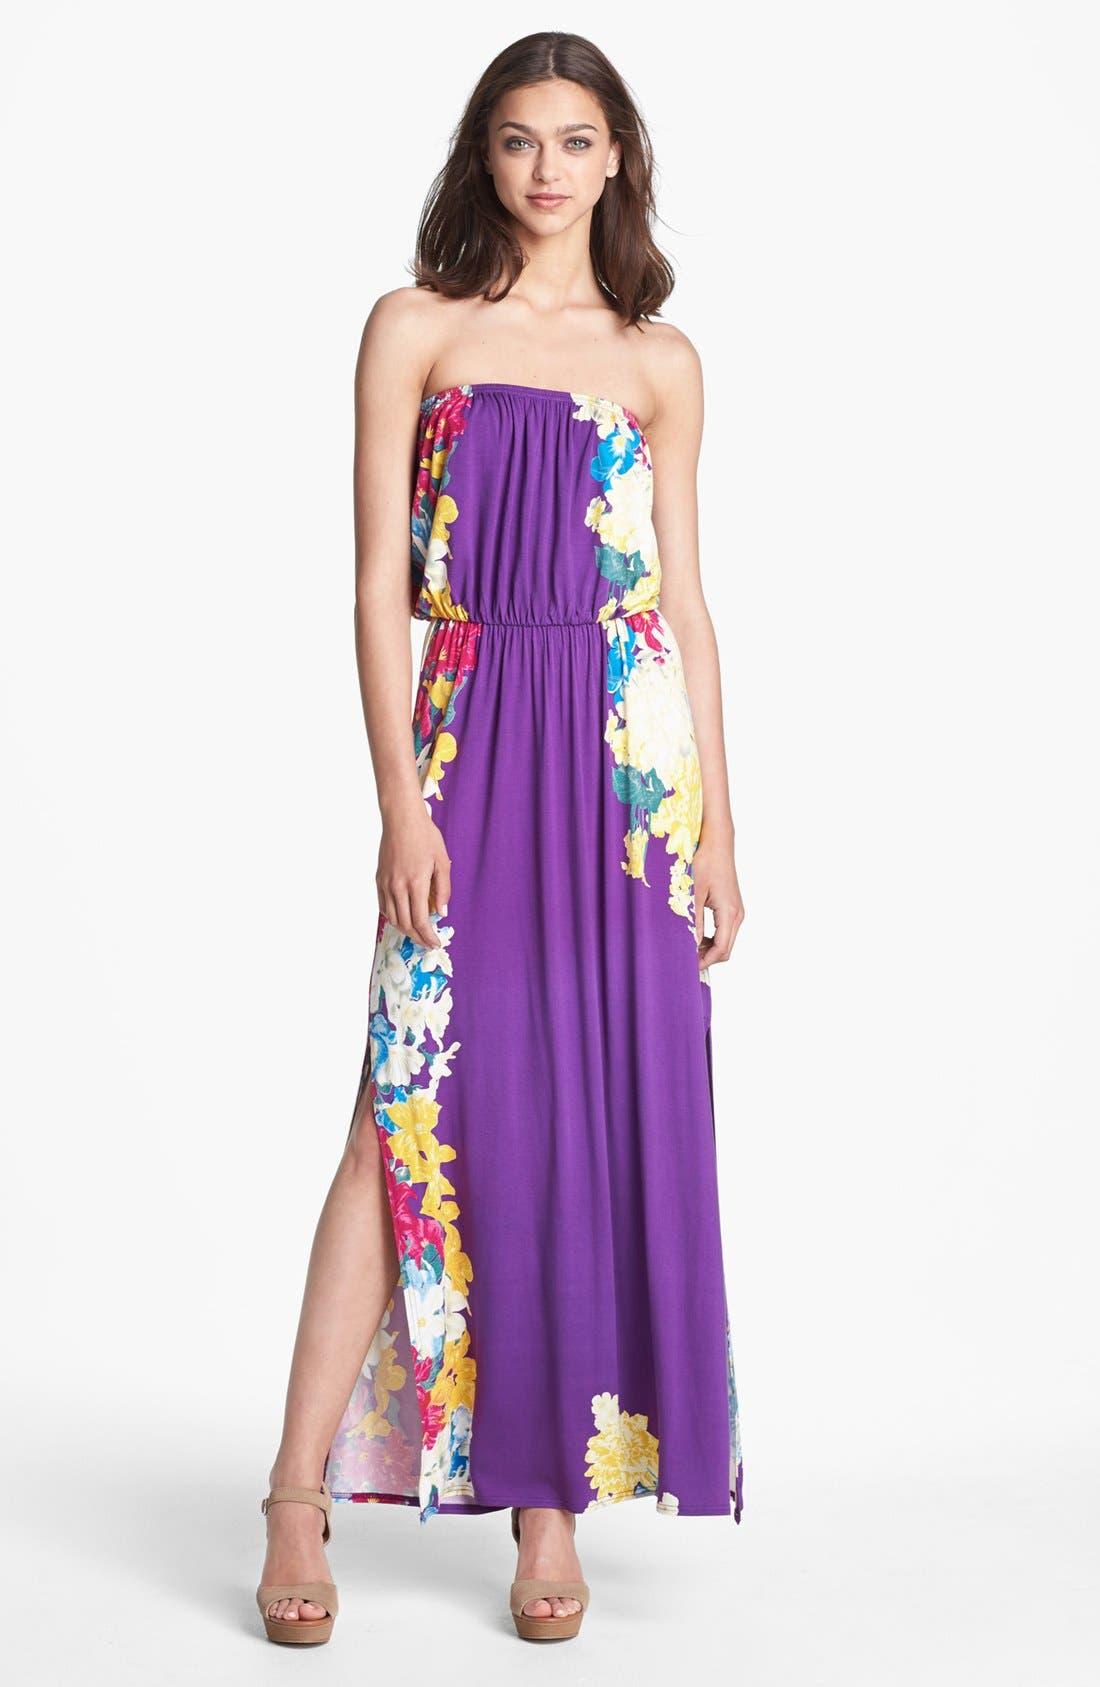 Main Image - Felicity & Coco Print Jersey Maxi Dress (Regular & Petite) (Nordstrom Exclusive)